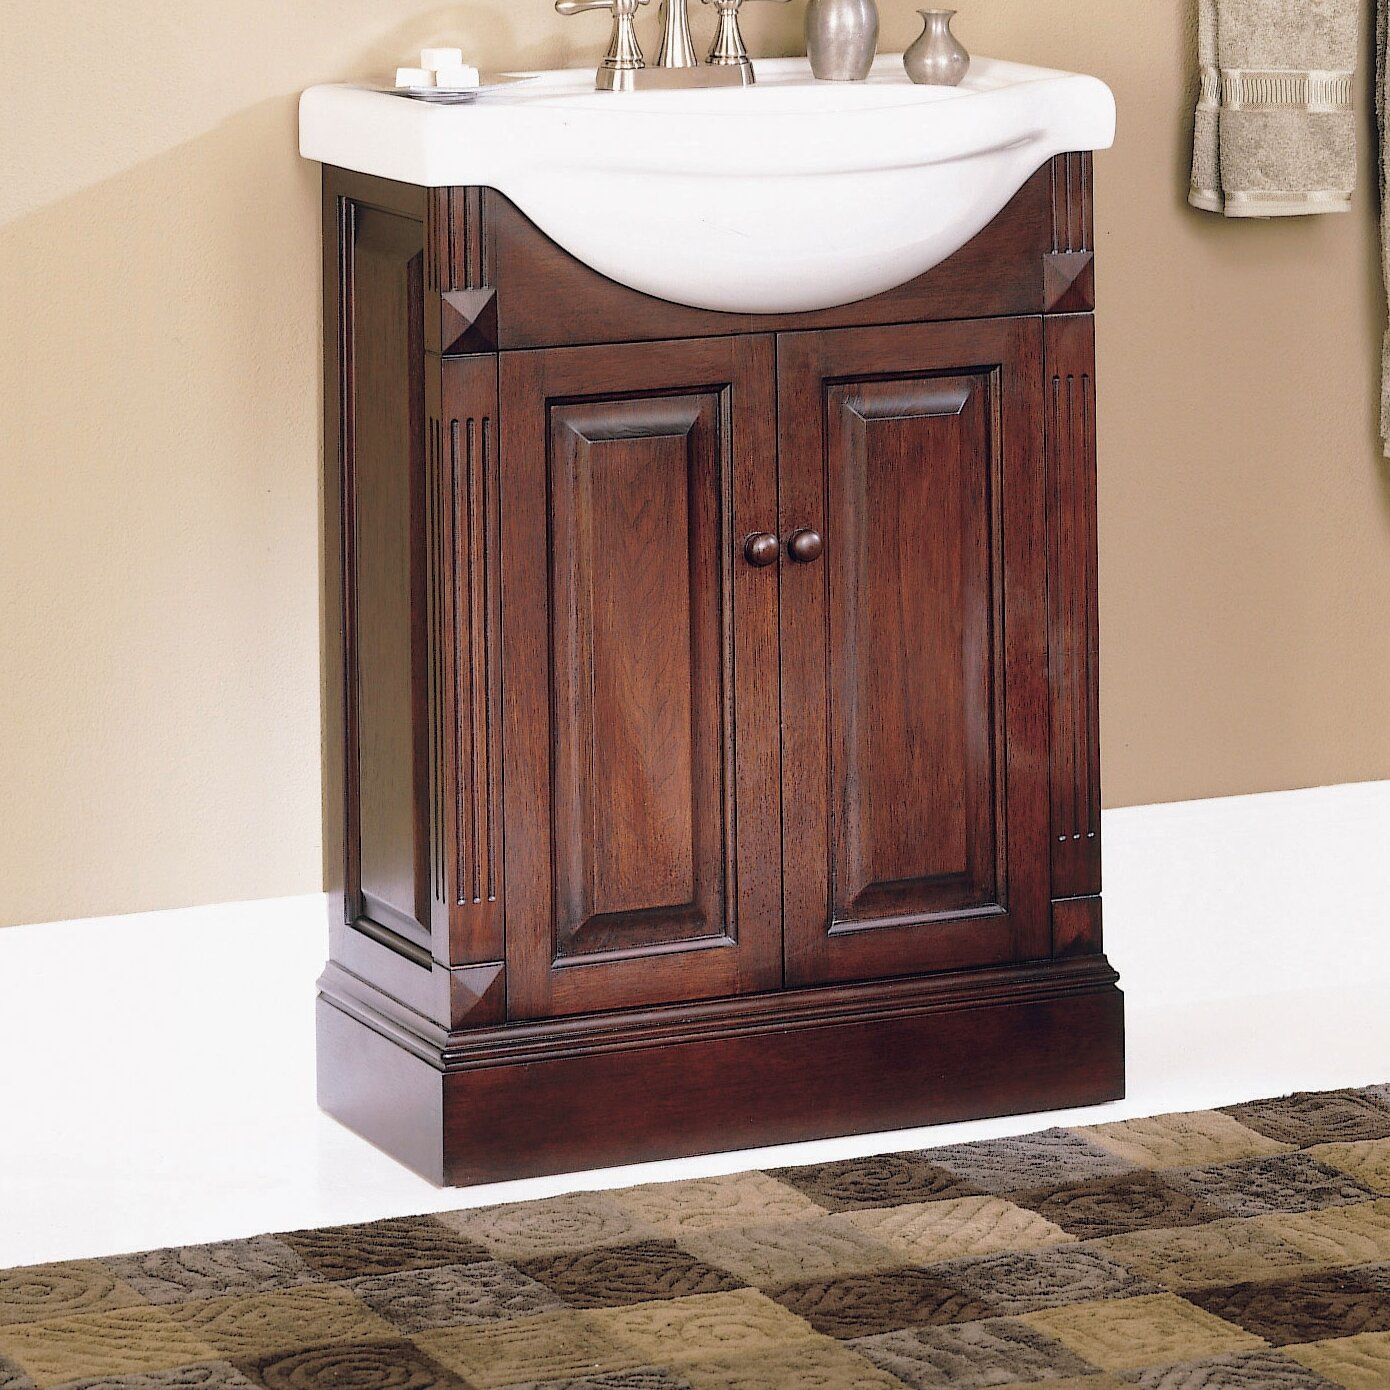 Foremost salerno 25 single bathroom vanity set with - Foremost bathroom vanity reviews ...